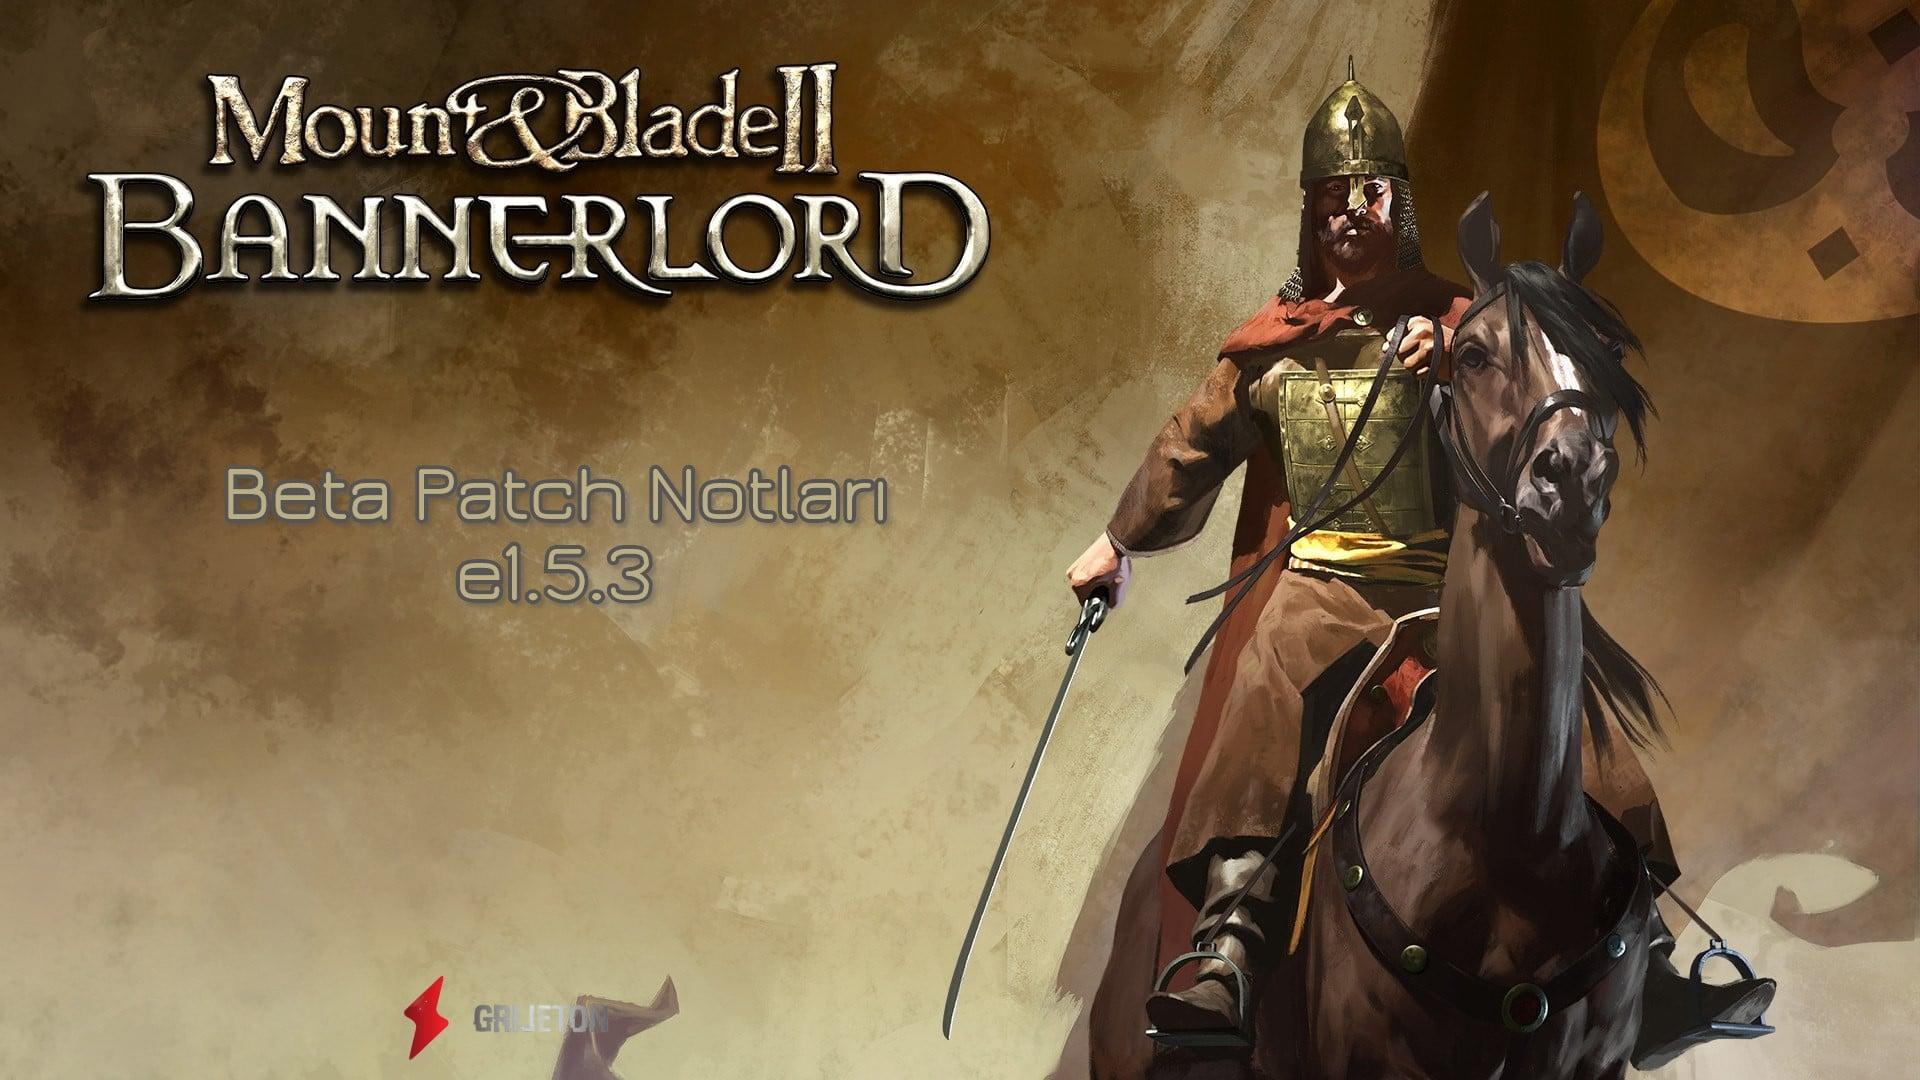 Bannerlord Beta Patch Notları